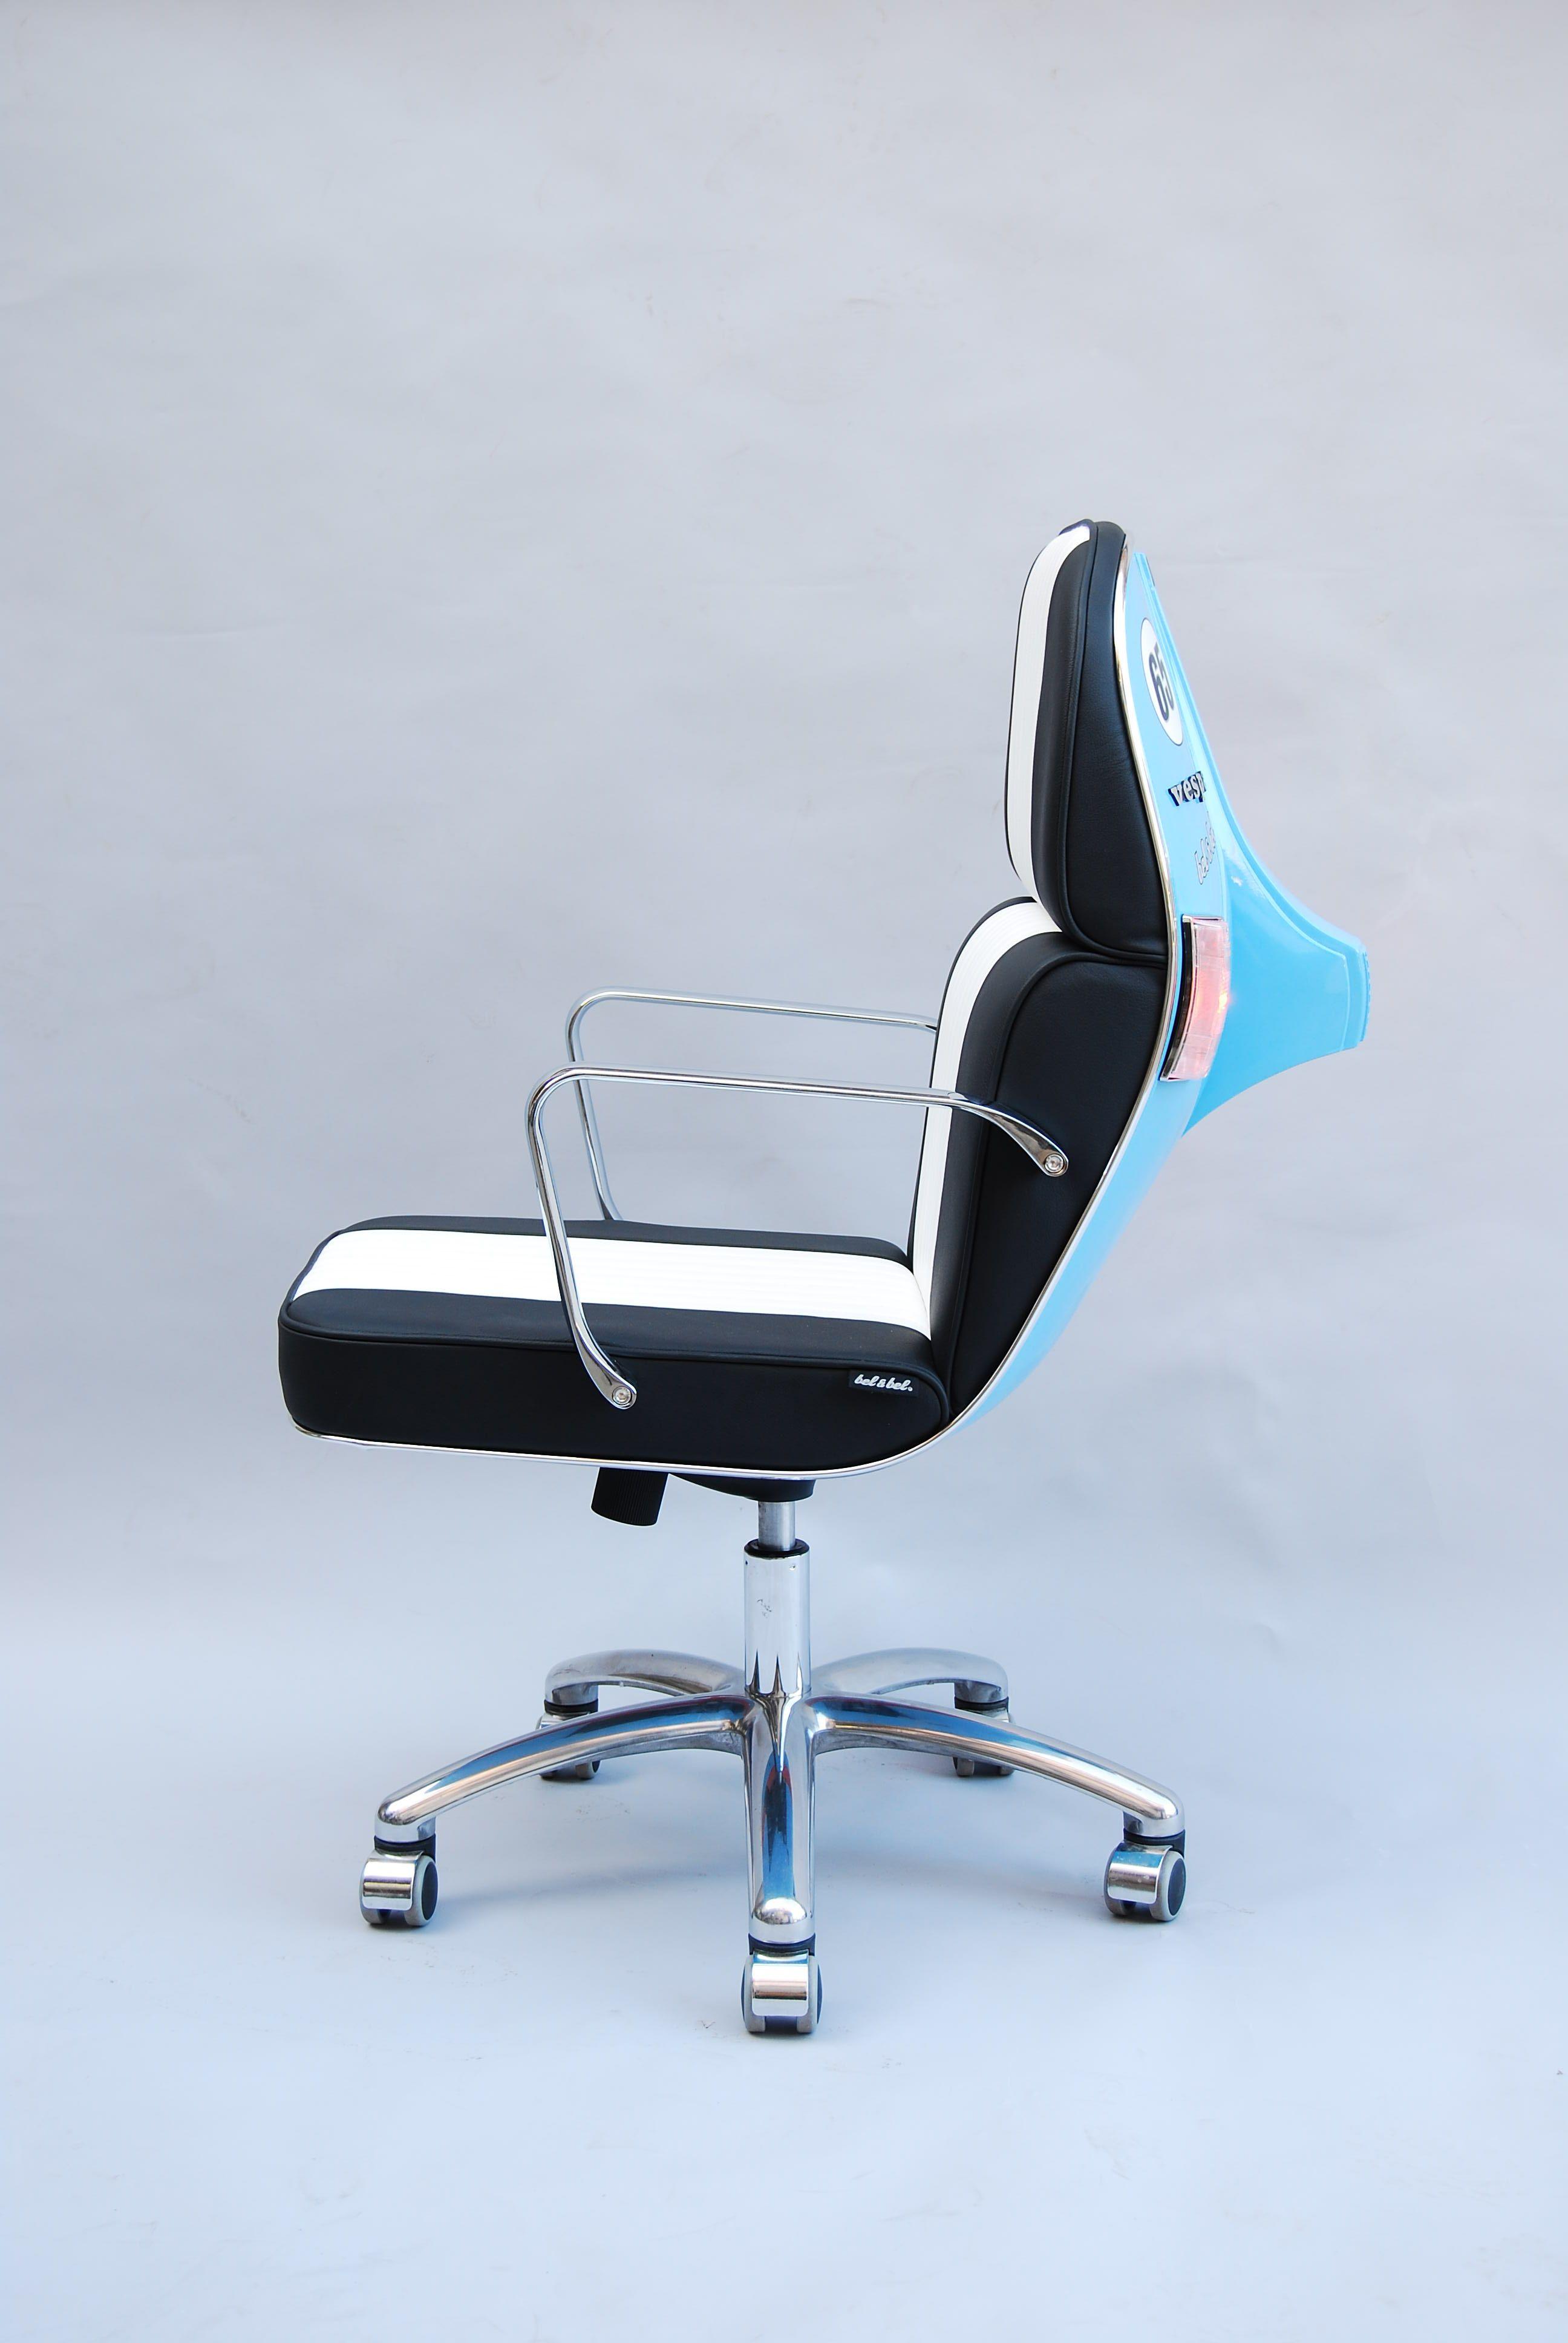 recycled vespa office chairs. Vespa Gulf Racing · RacingInternetVespaRecyclingOriginalsFurniture MotorcycleWaspHornet Recycled Office Chairs